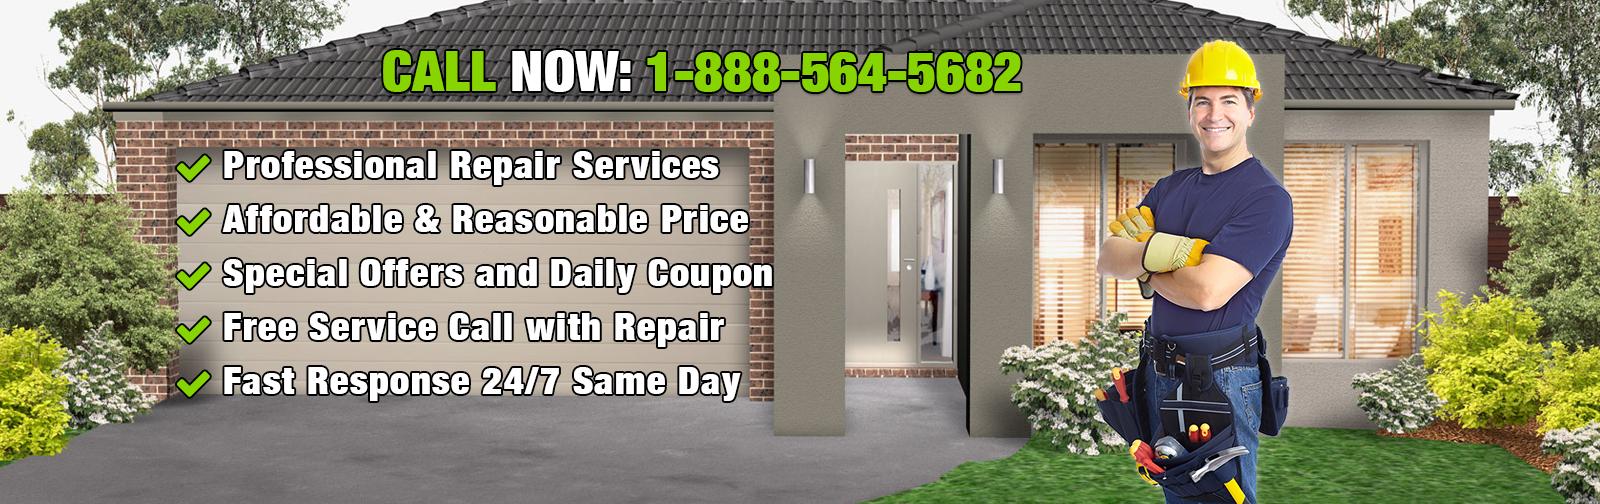 Quality Garage Door Repair East Hartford Ct 860 956 3636